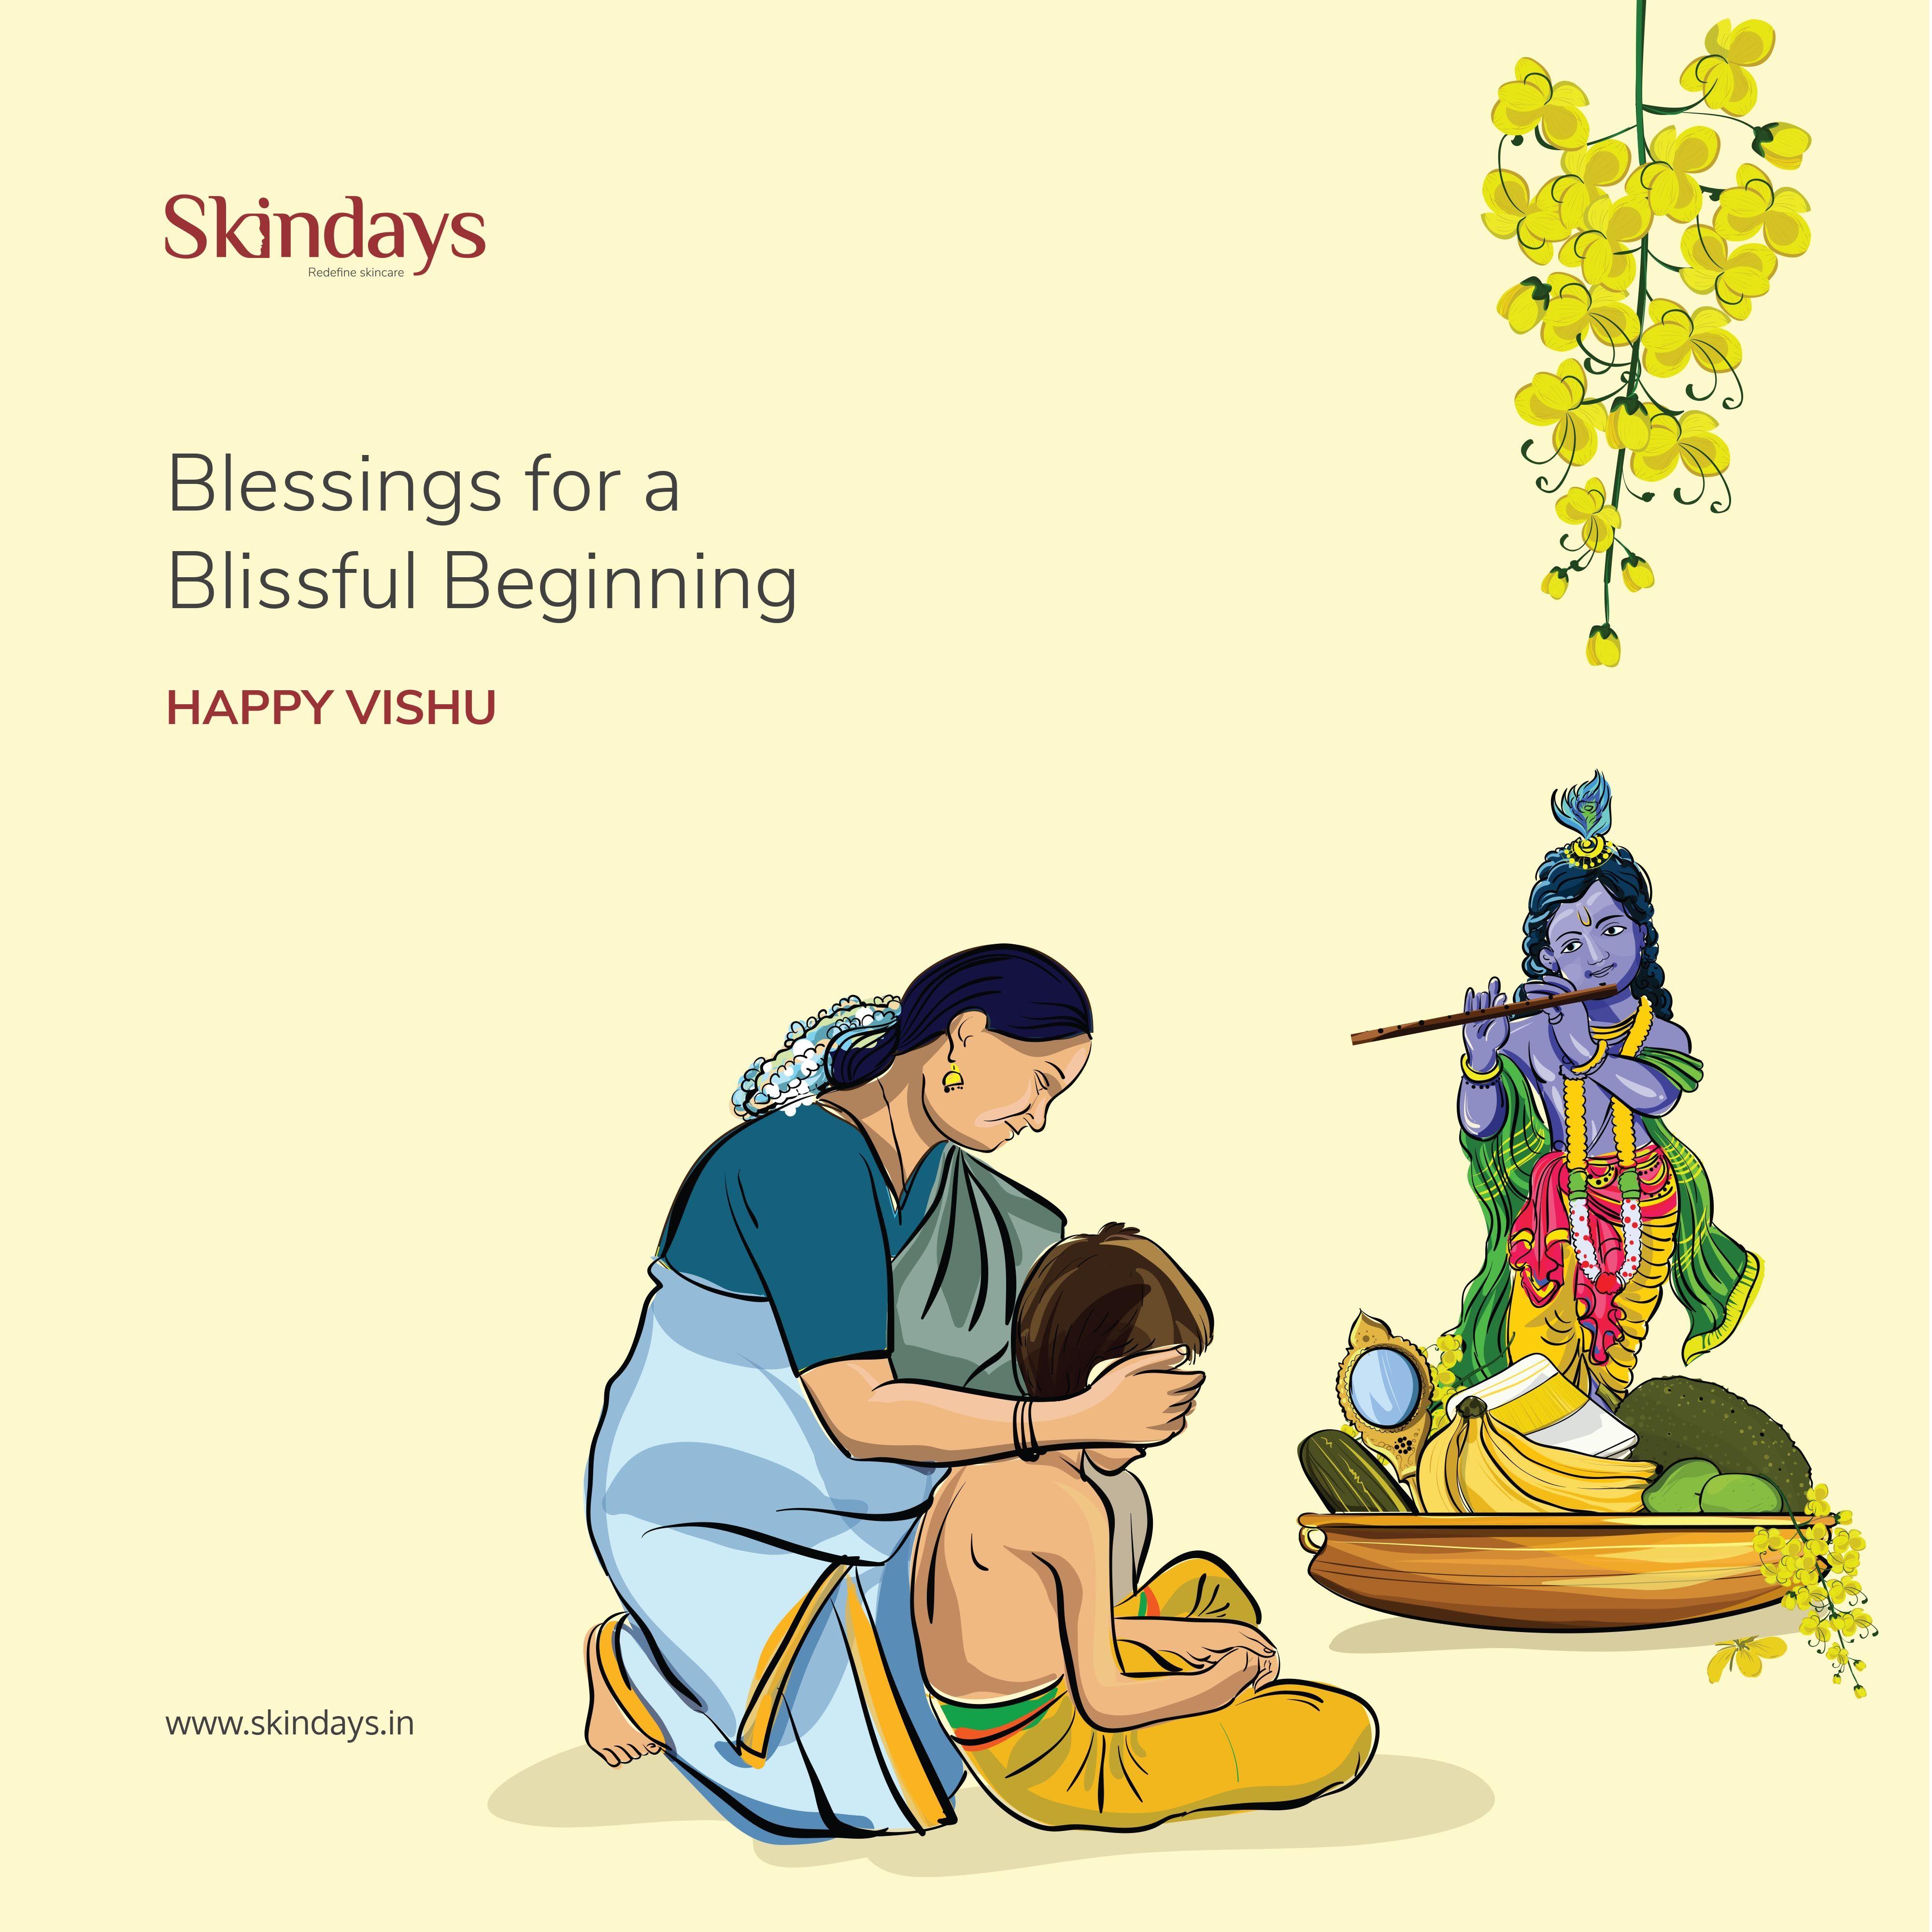 Pin by Swathy Sudarsanan on Cute Bengali new year, Vishu